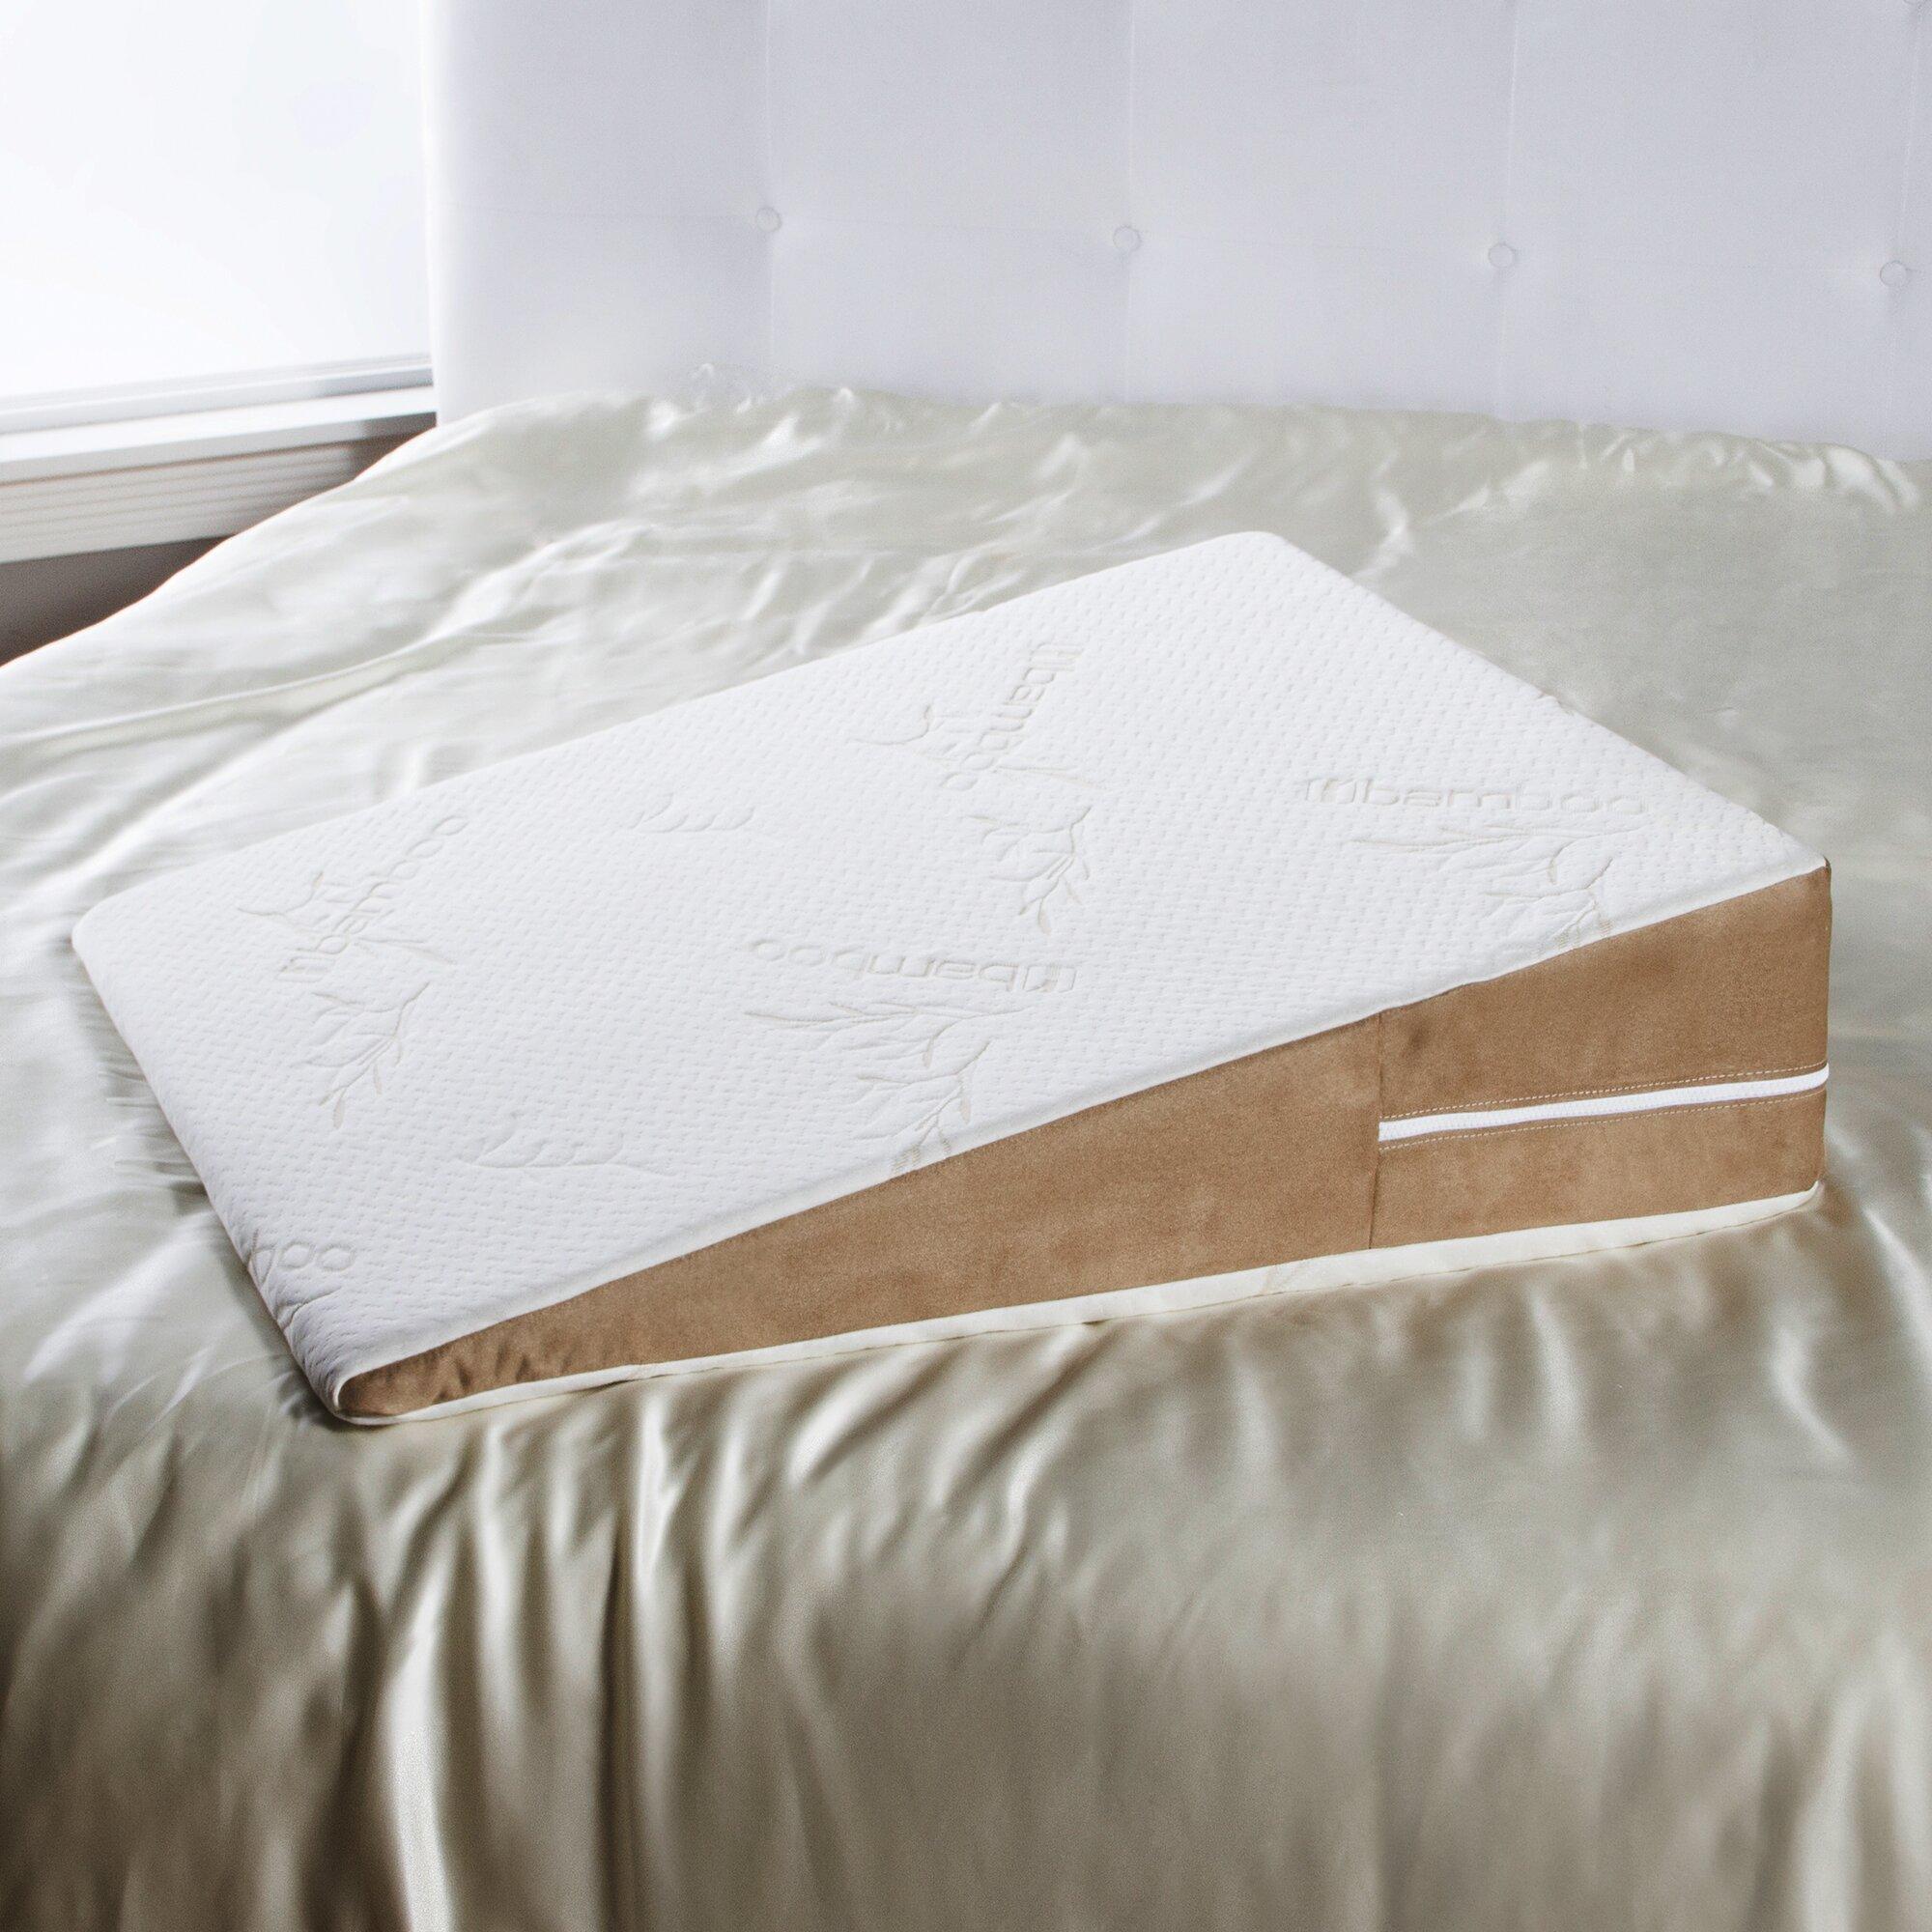 Avana Avana Bed Wedge Memory Foam Pillow Amp Reviews